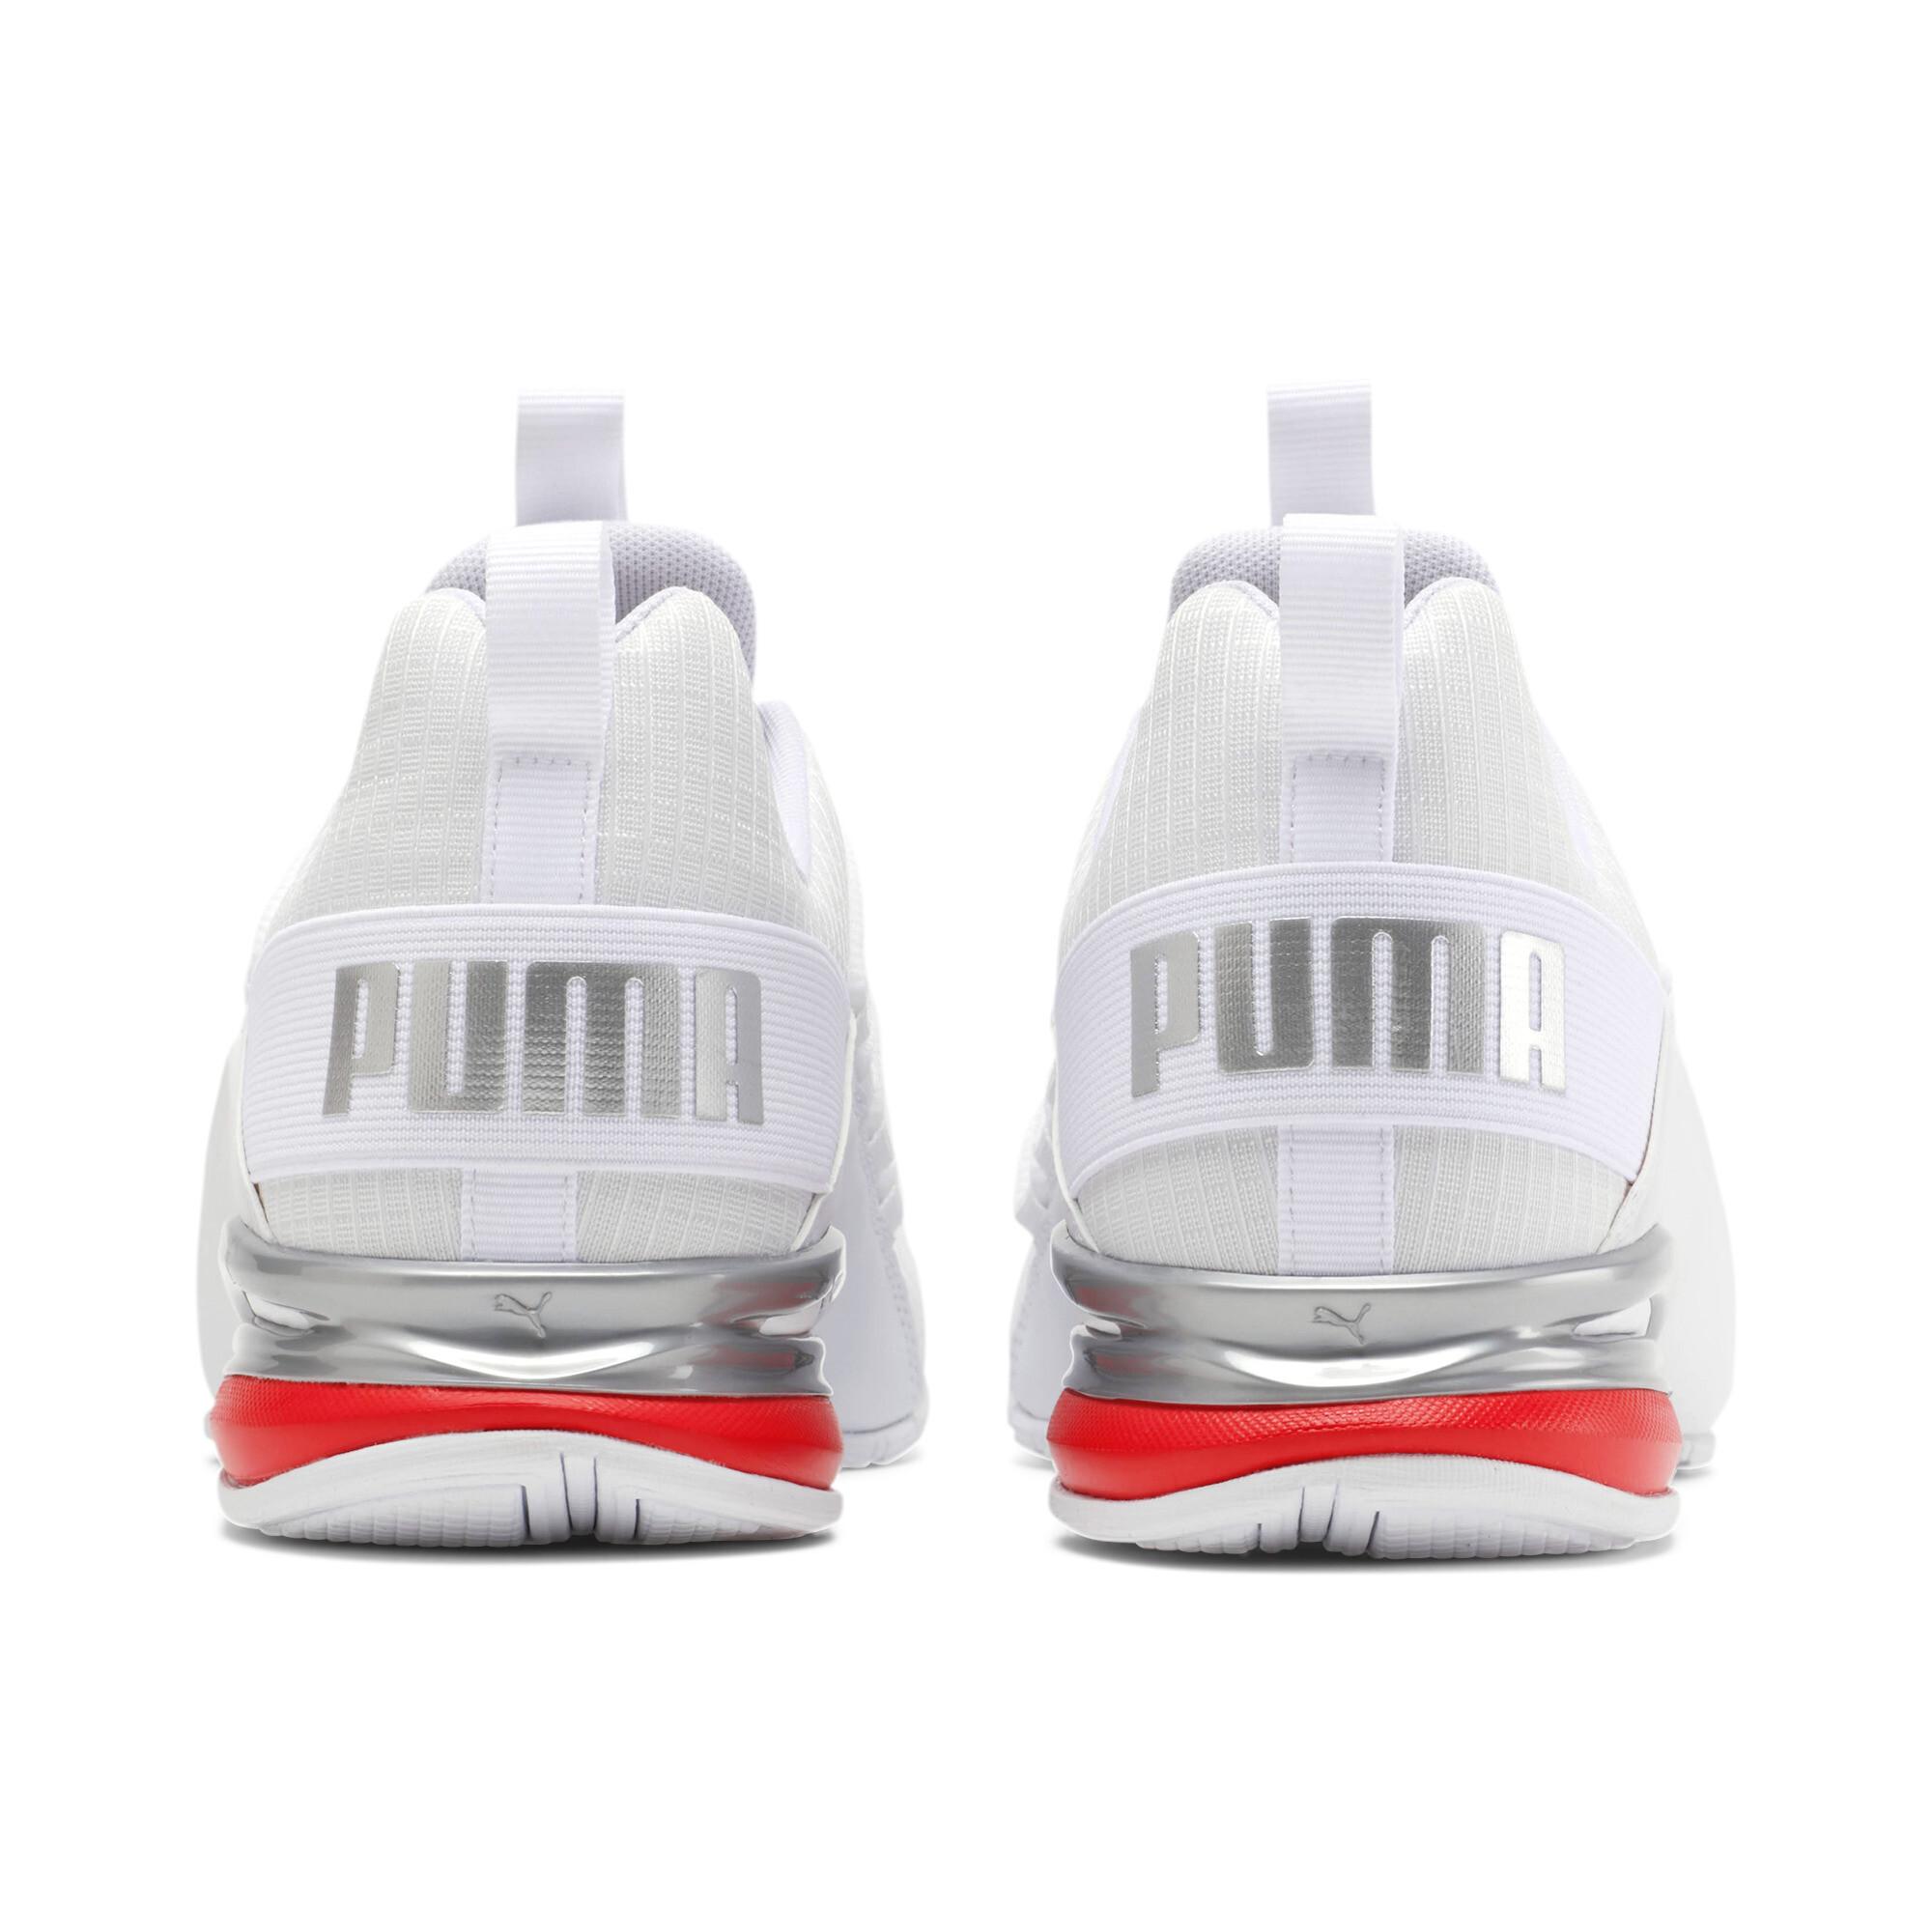 PUMA-Men-039-s-Momenta-Ripstop-Training-Shoes thumbnail 3